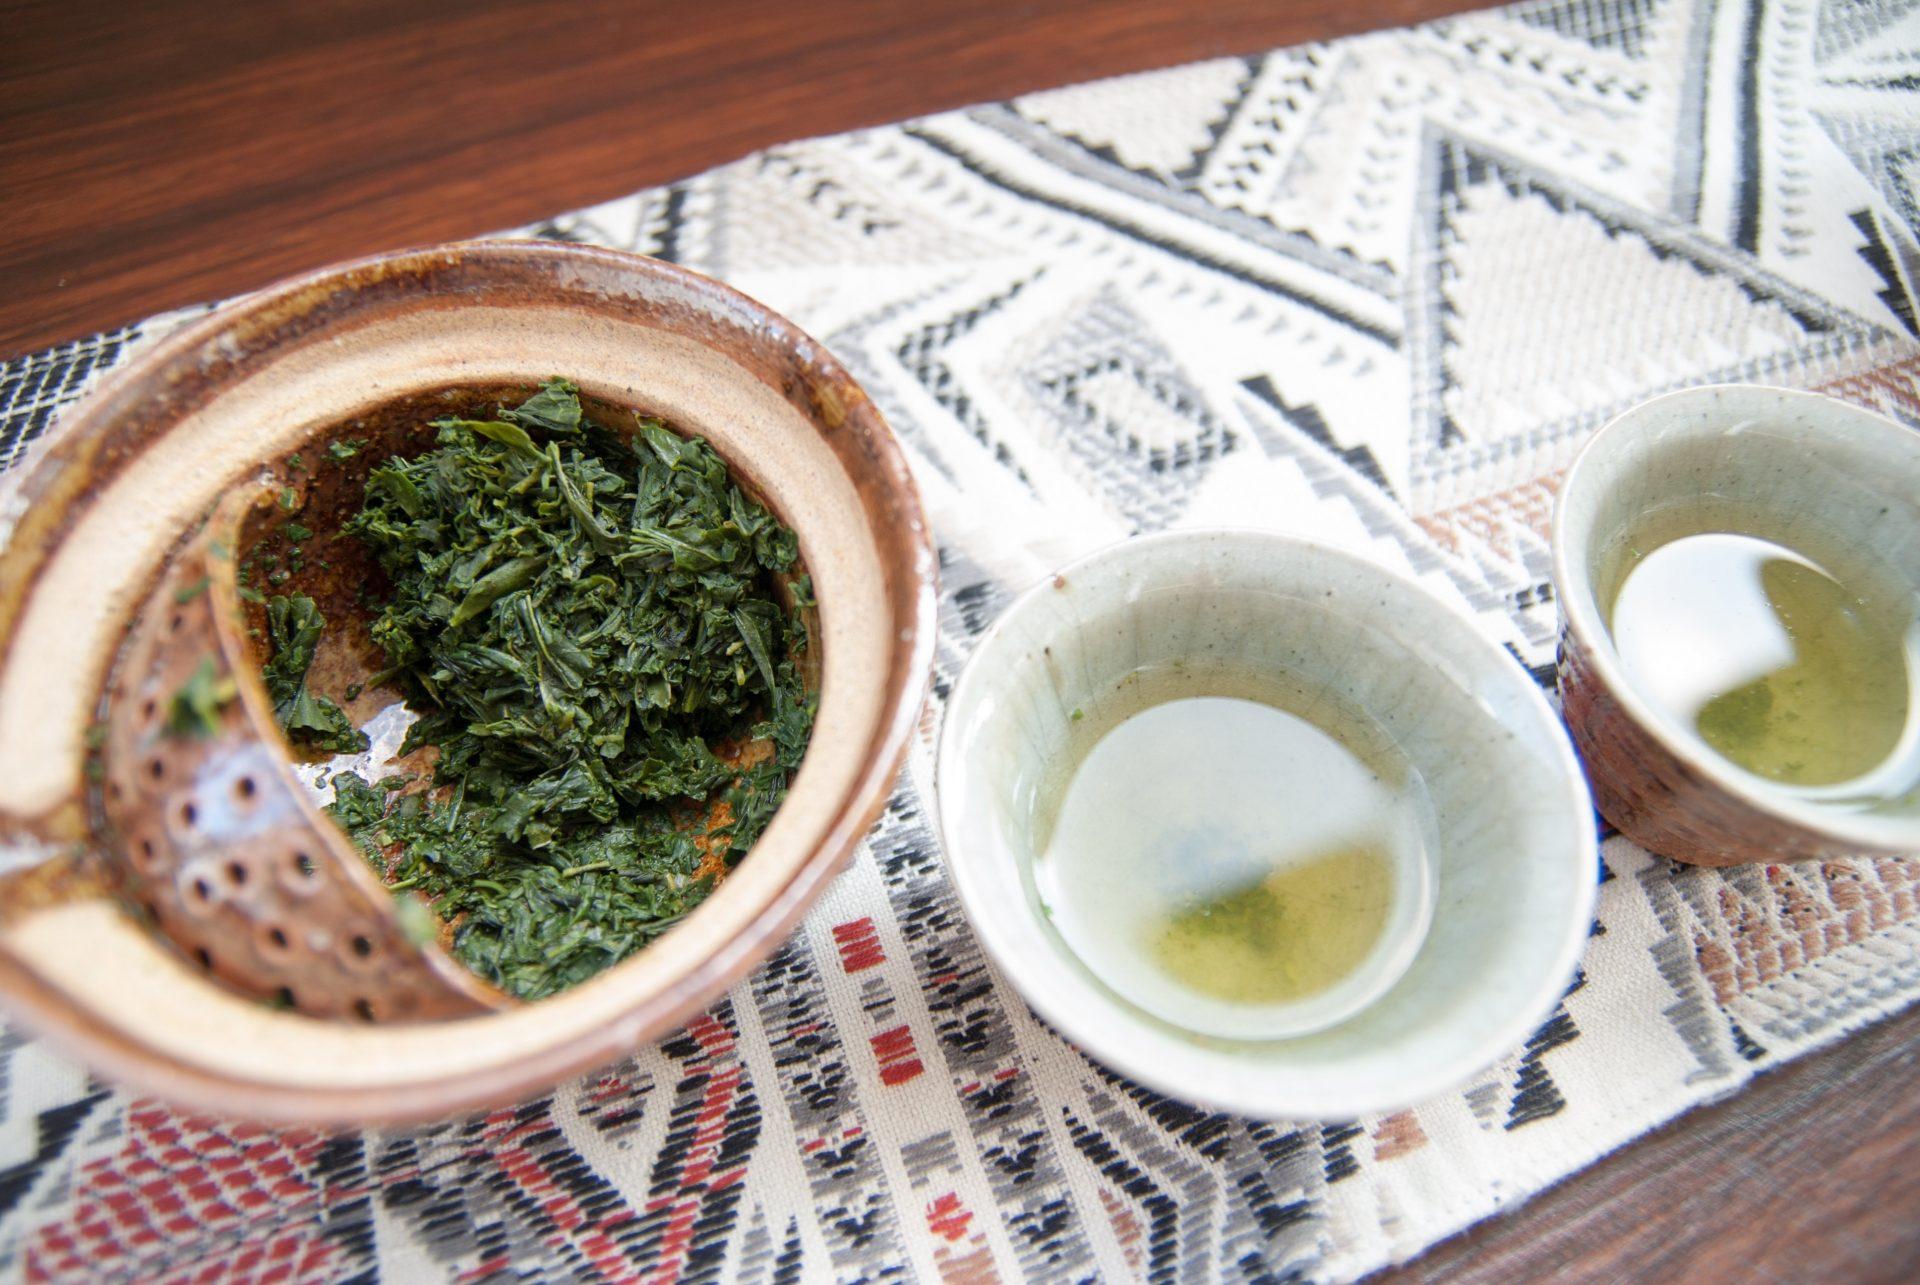 Tokuya's Natural Raw Gyokuro (Kamo Natural Gyokuro)